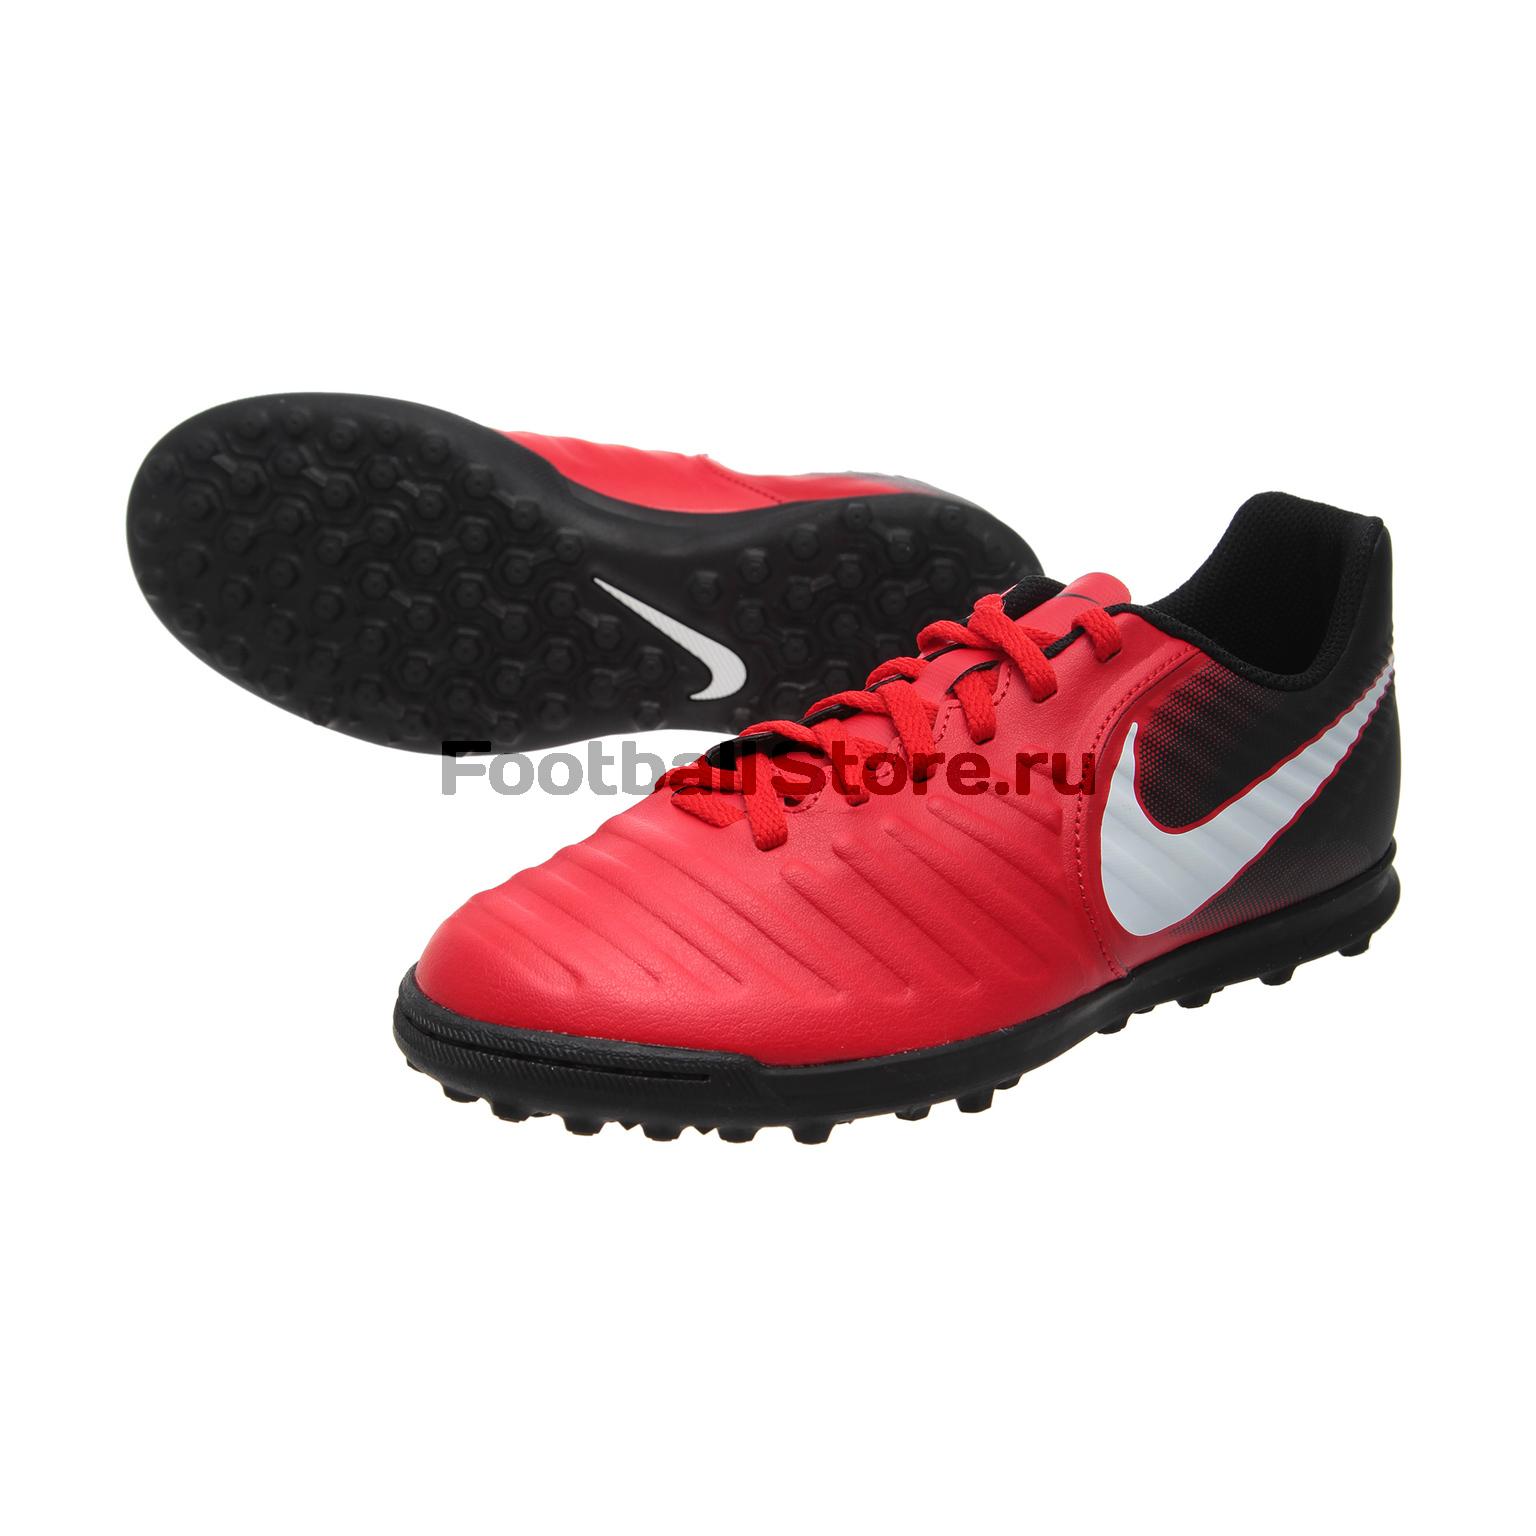 Шиповки Nike JR Tiempo X Rio IV TF 897736-616